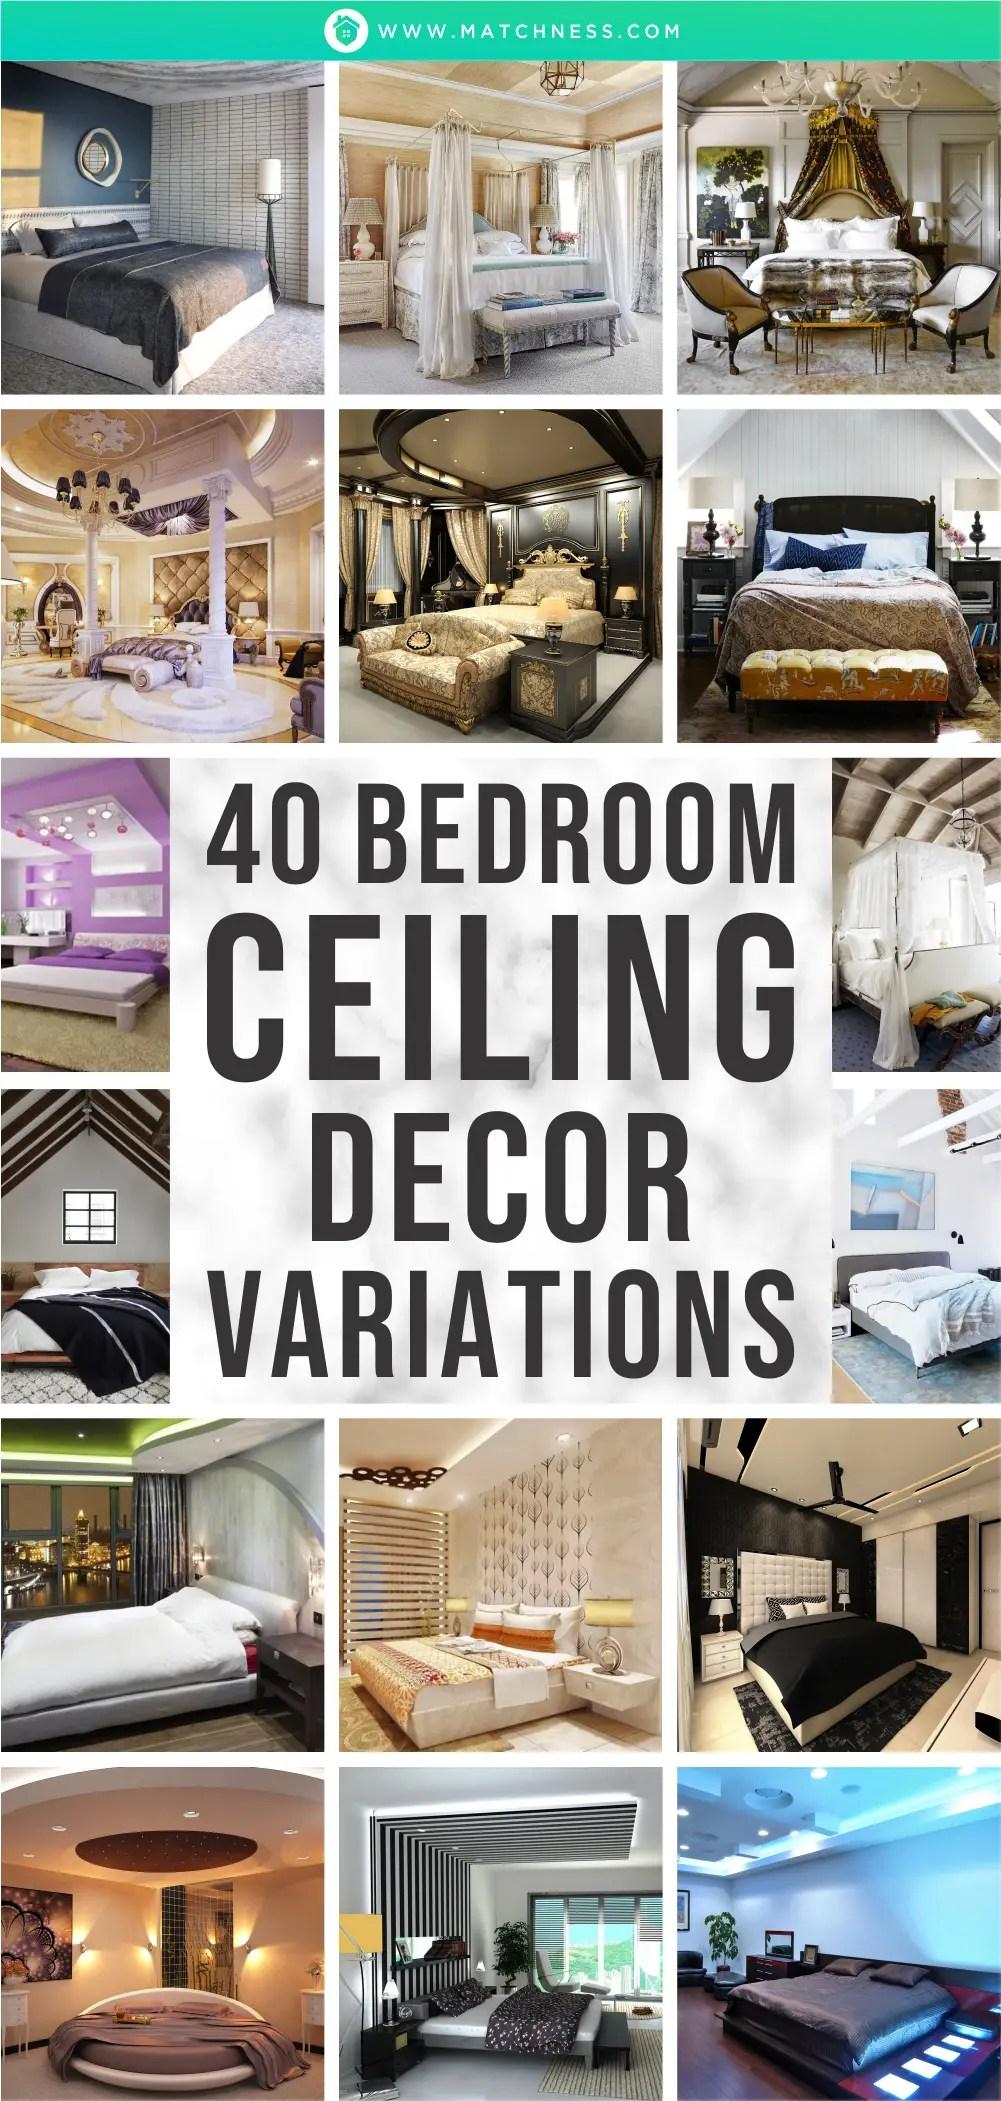 40-bedroom-ceiling-decor-variations1